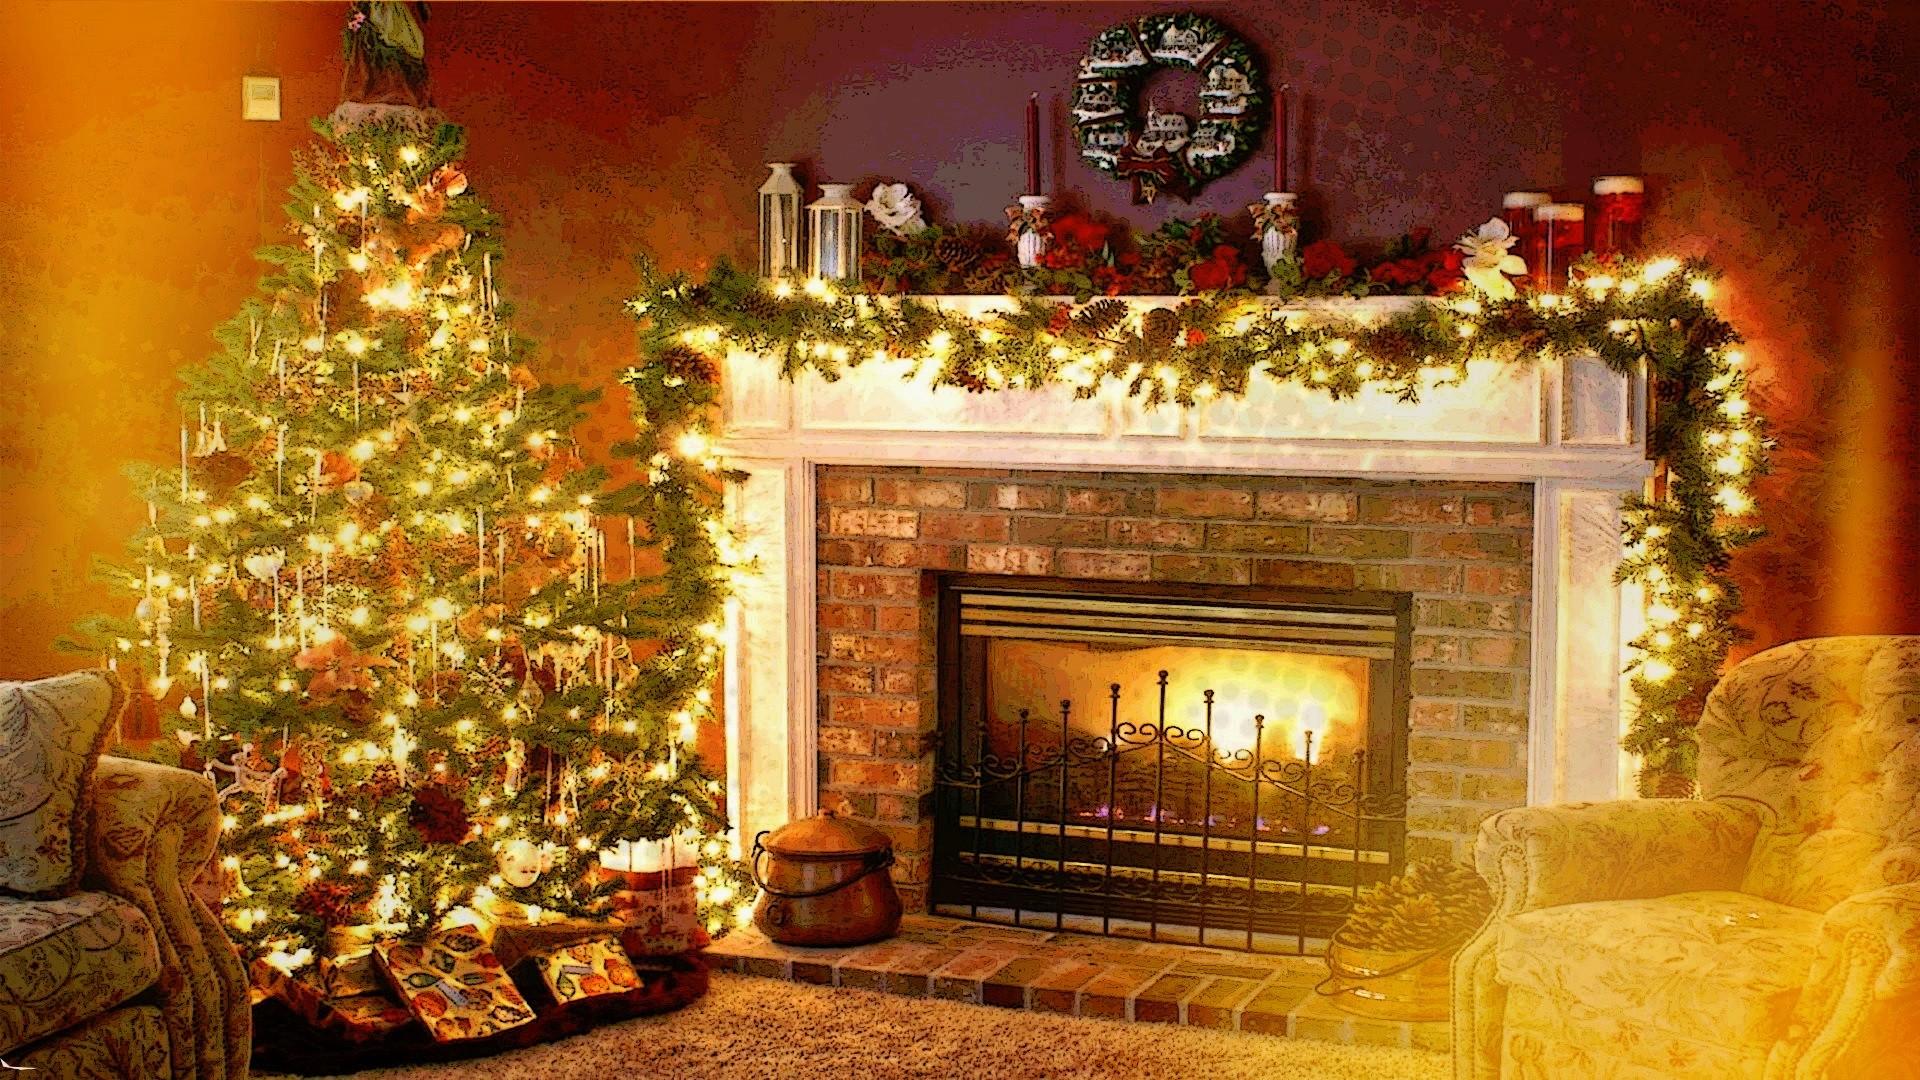 fondos de pantalla interior rbol de navidad chimenea. Black Bedroom Furniture Sets. Home Design Ideas